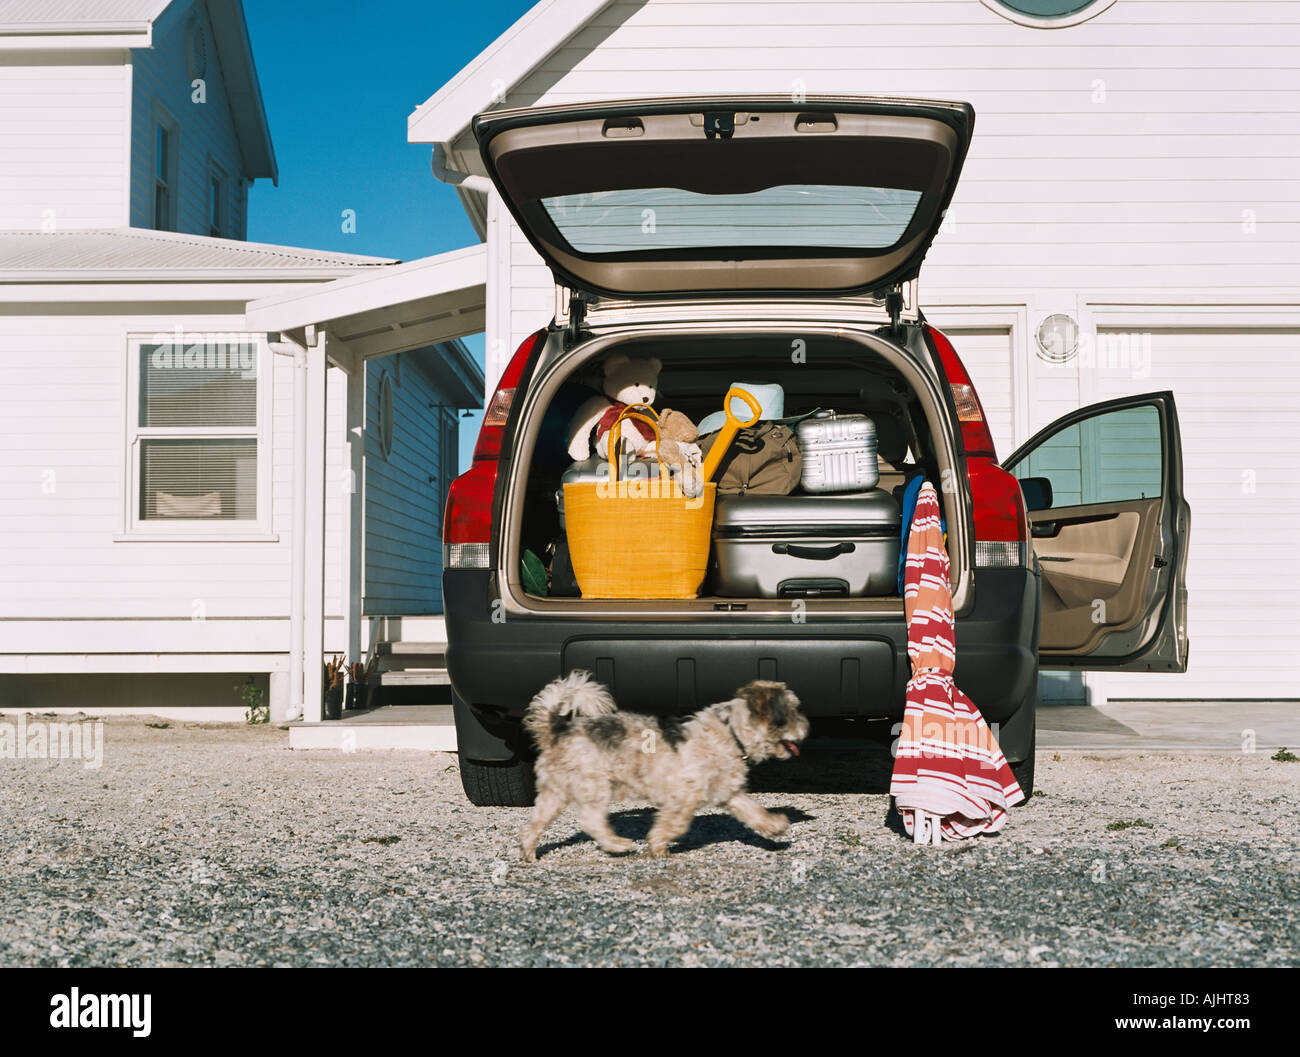 Dog by car full of luggage - Stock Image